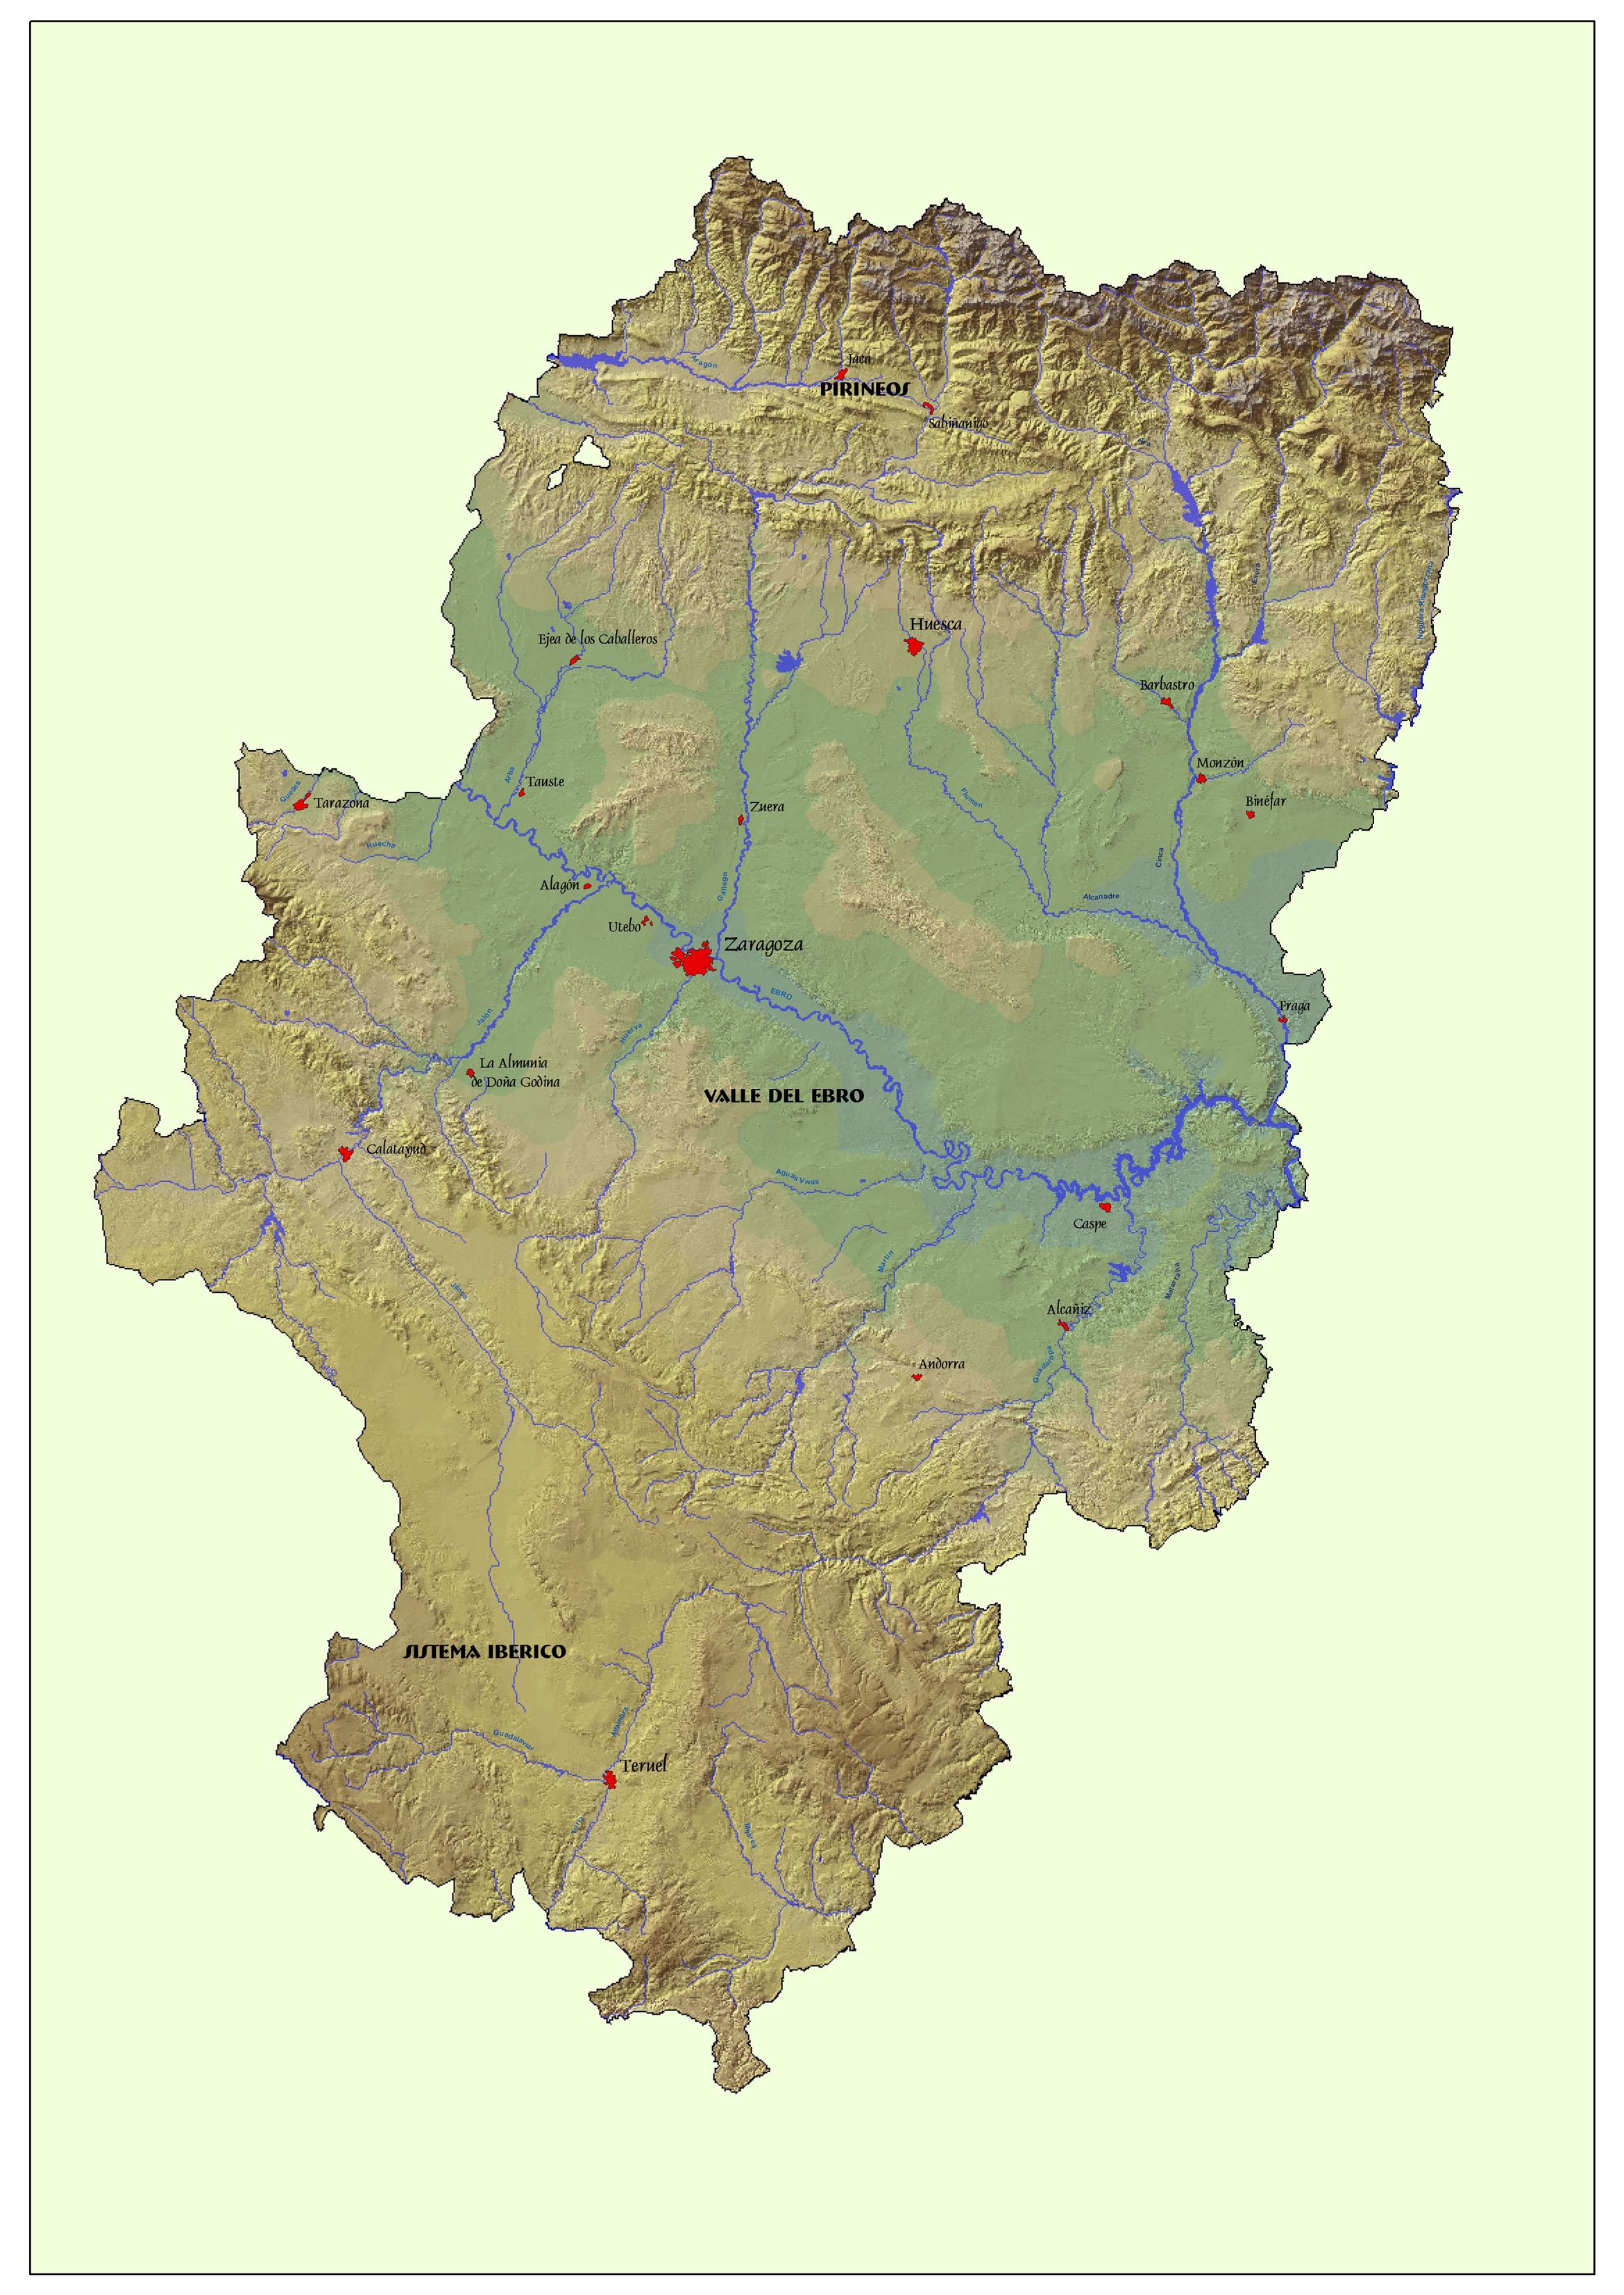 Aragon map